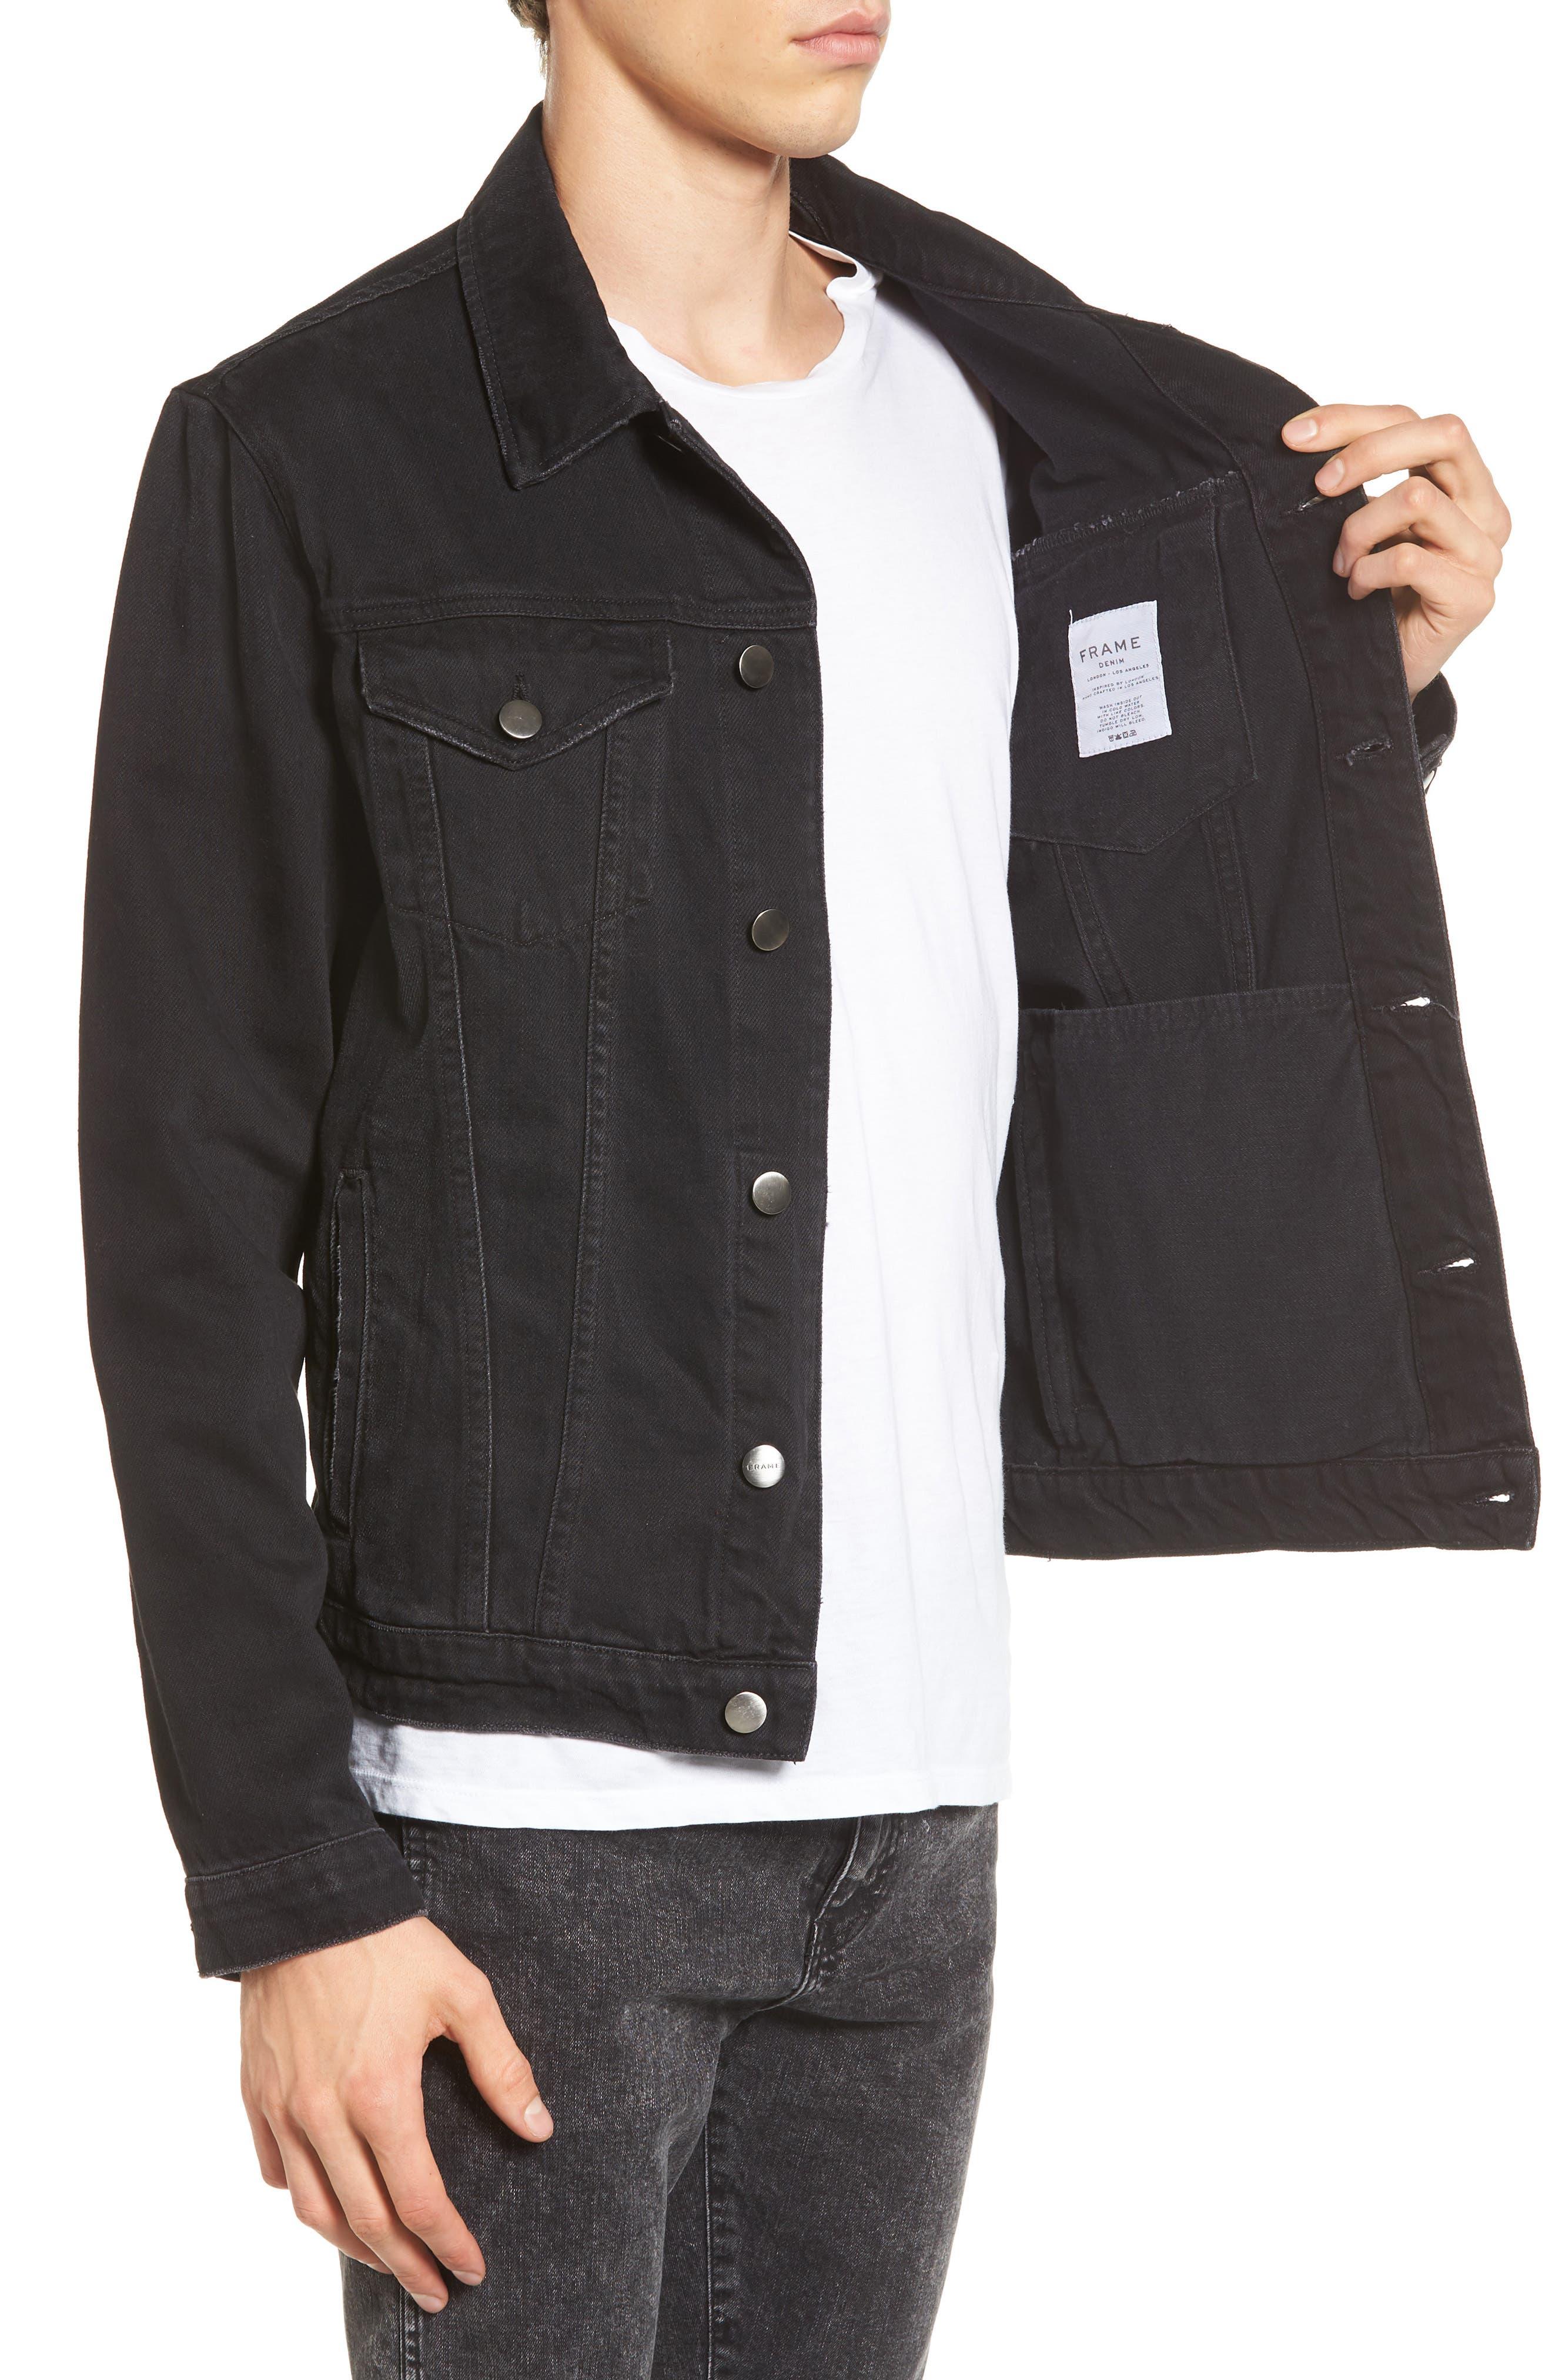 L'Homme Denim Jacket,                             Alternate thumbnail 3, color,                             001